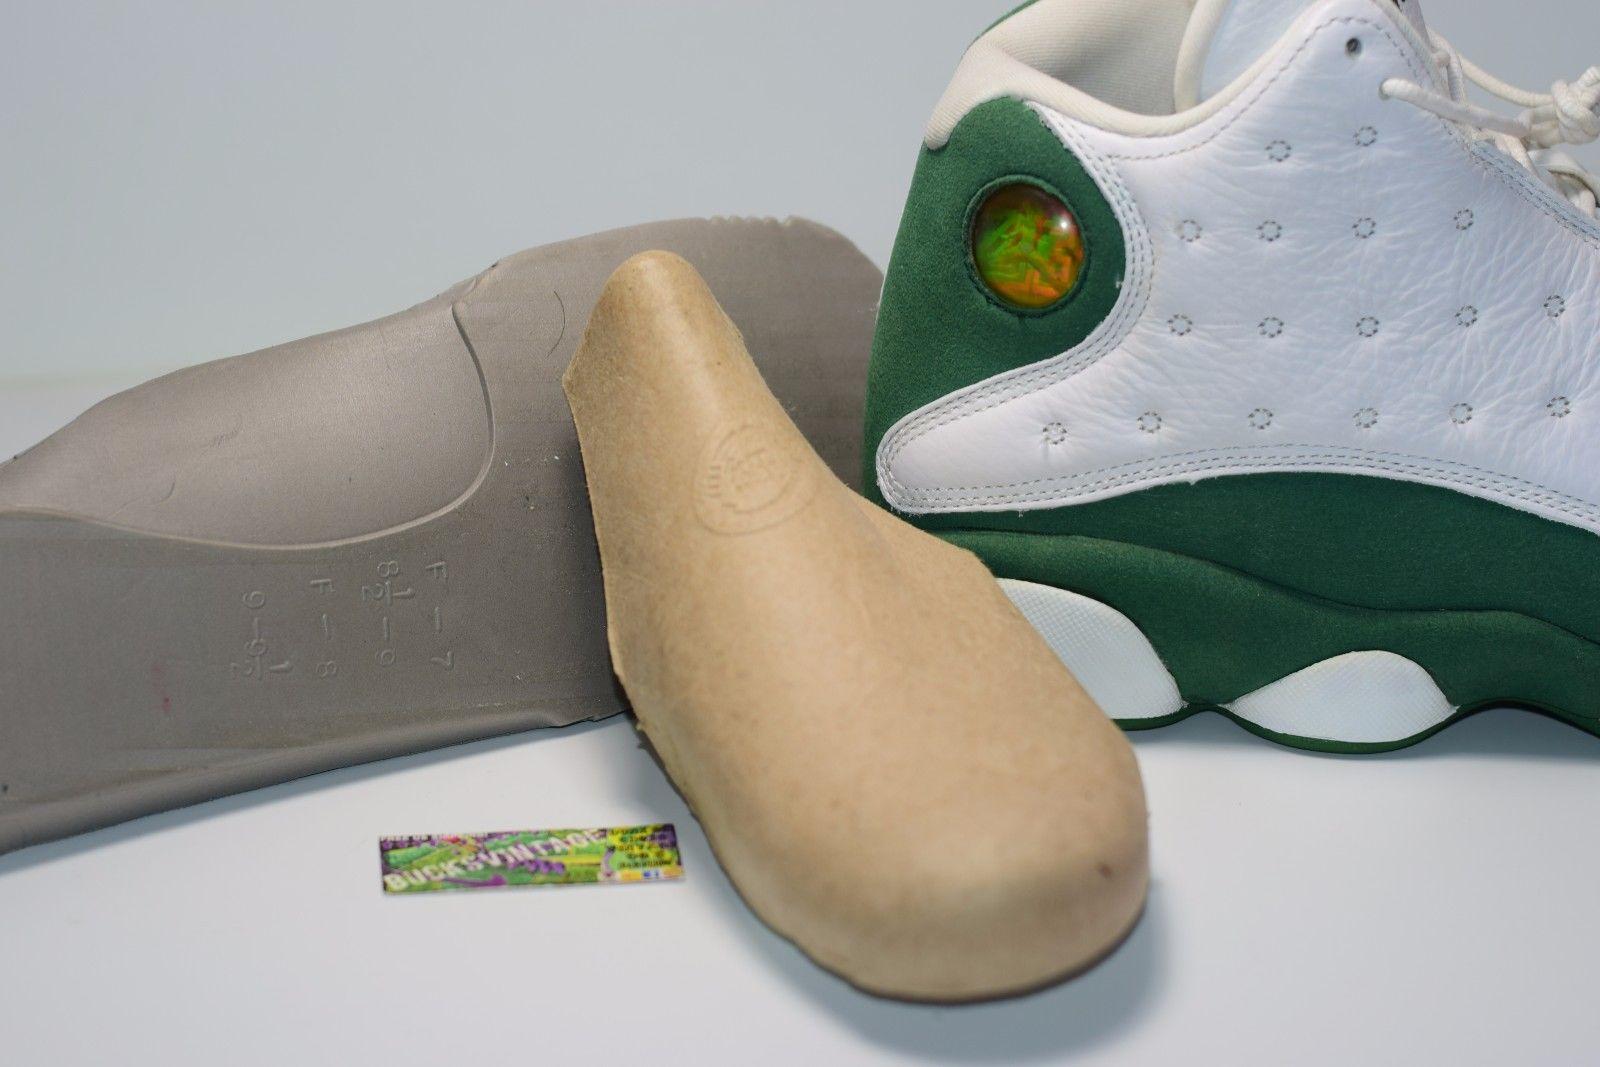 wholesale dealer 266fd ddfd1 ... Size 9   2011 Nike Air Jordan XIII 13 Retro Ray Allen PE Authentic  Boston Celtics ...